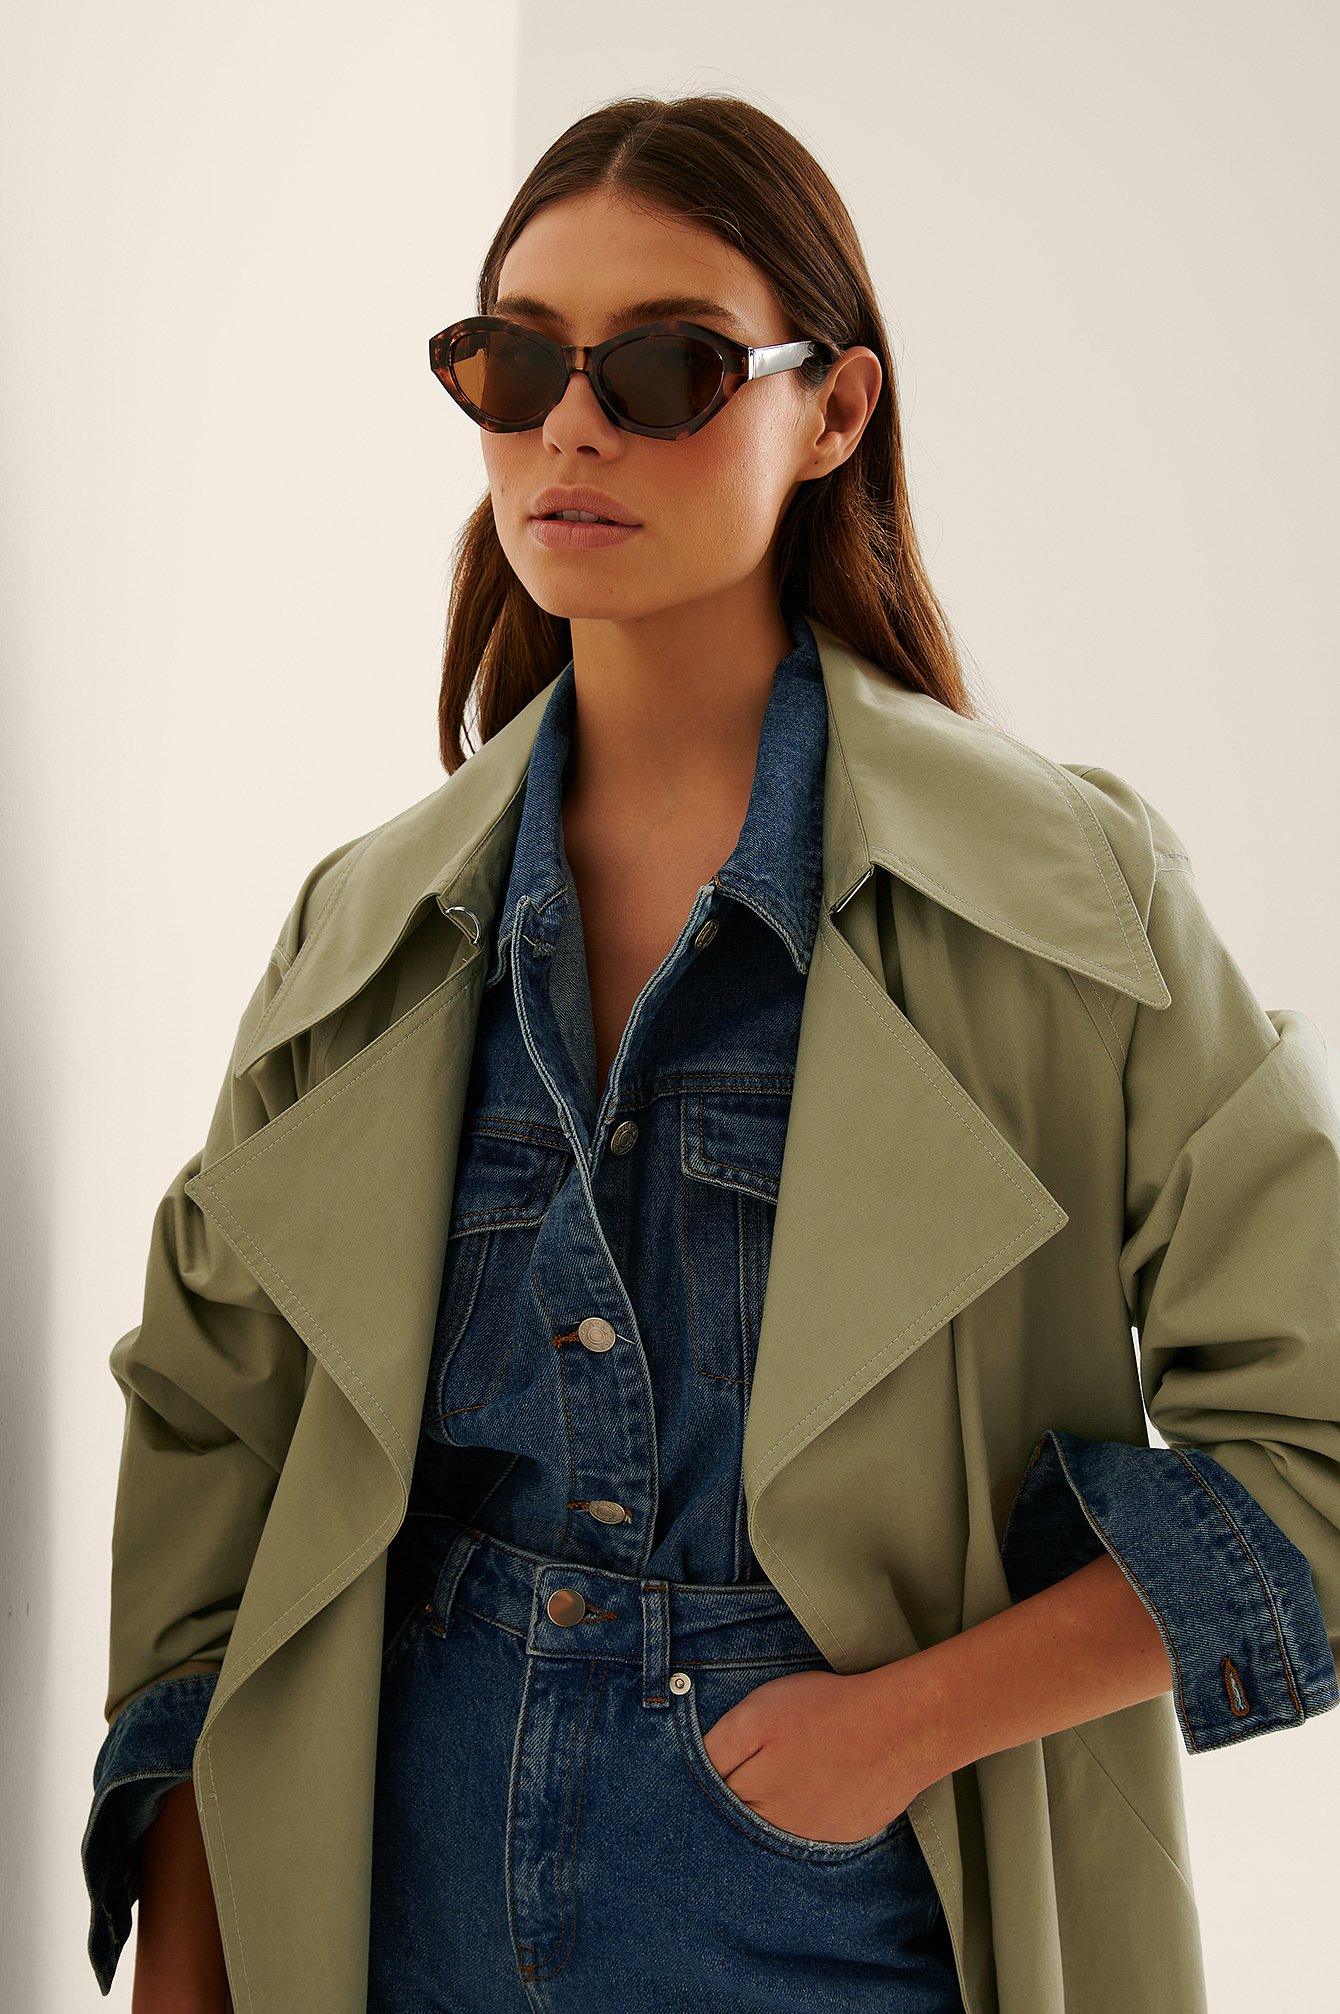 na-kd accessories -  Eckige Cateye-Sonnenbrille - Brown